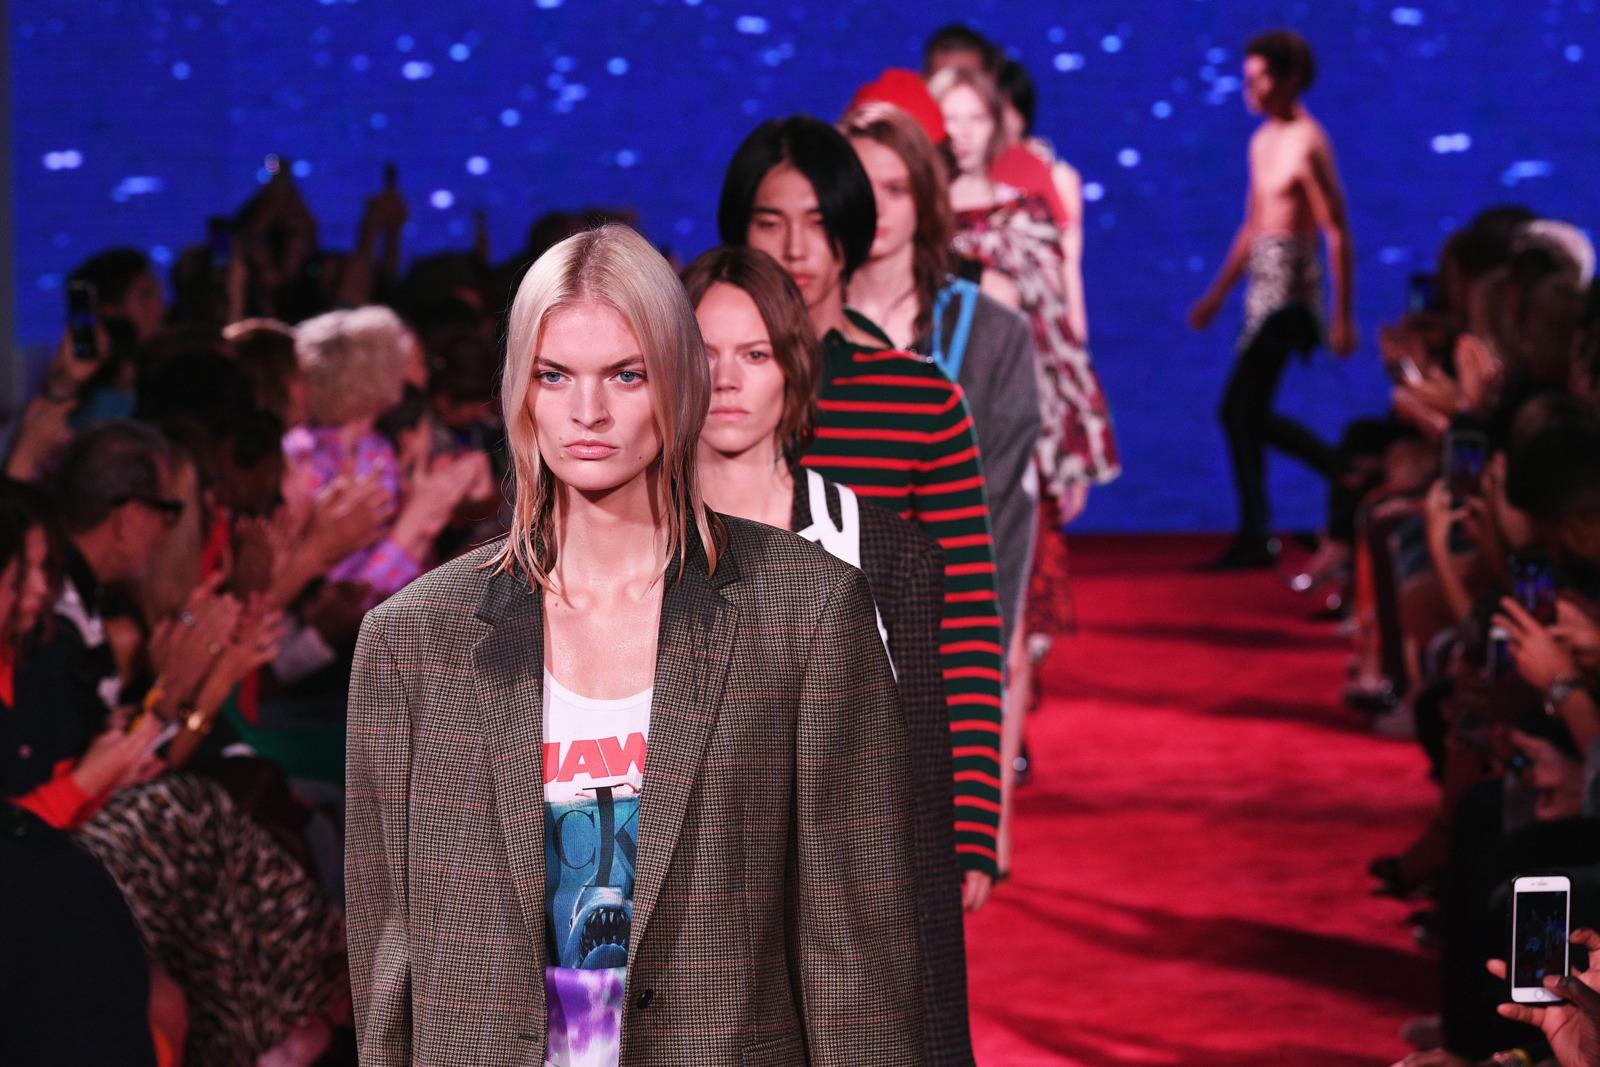 Calvin Klein Is Undergoing Some Changes